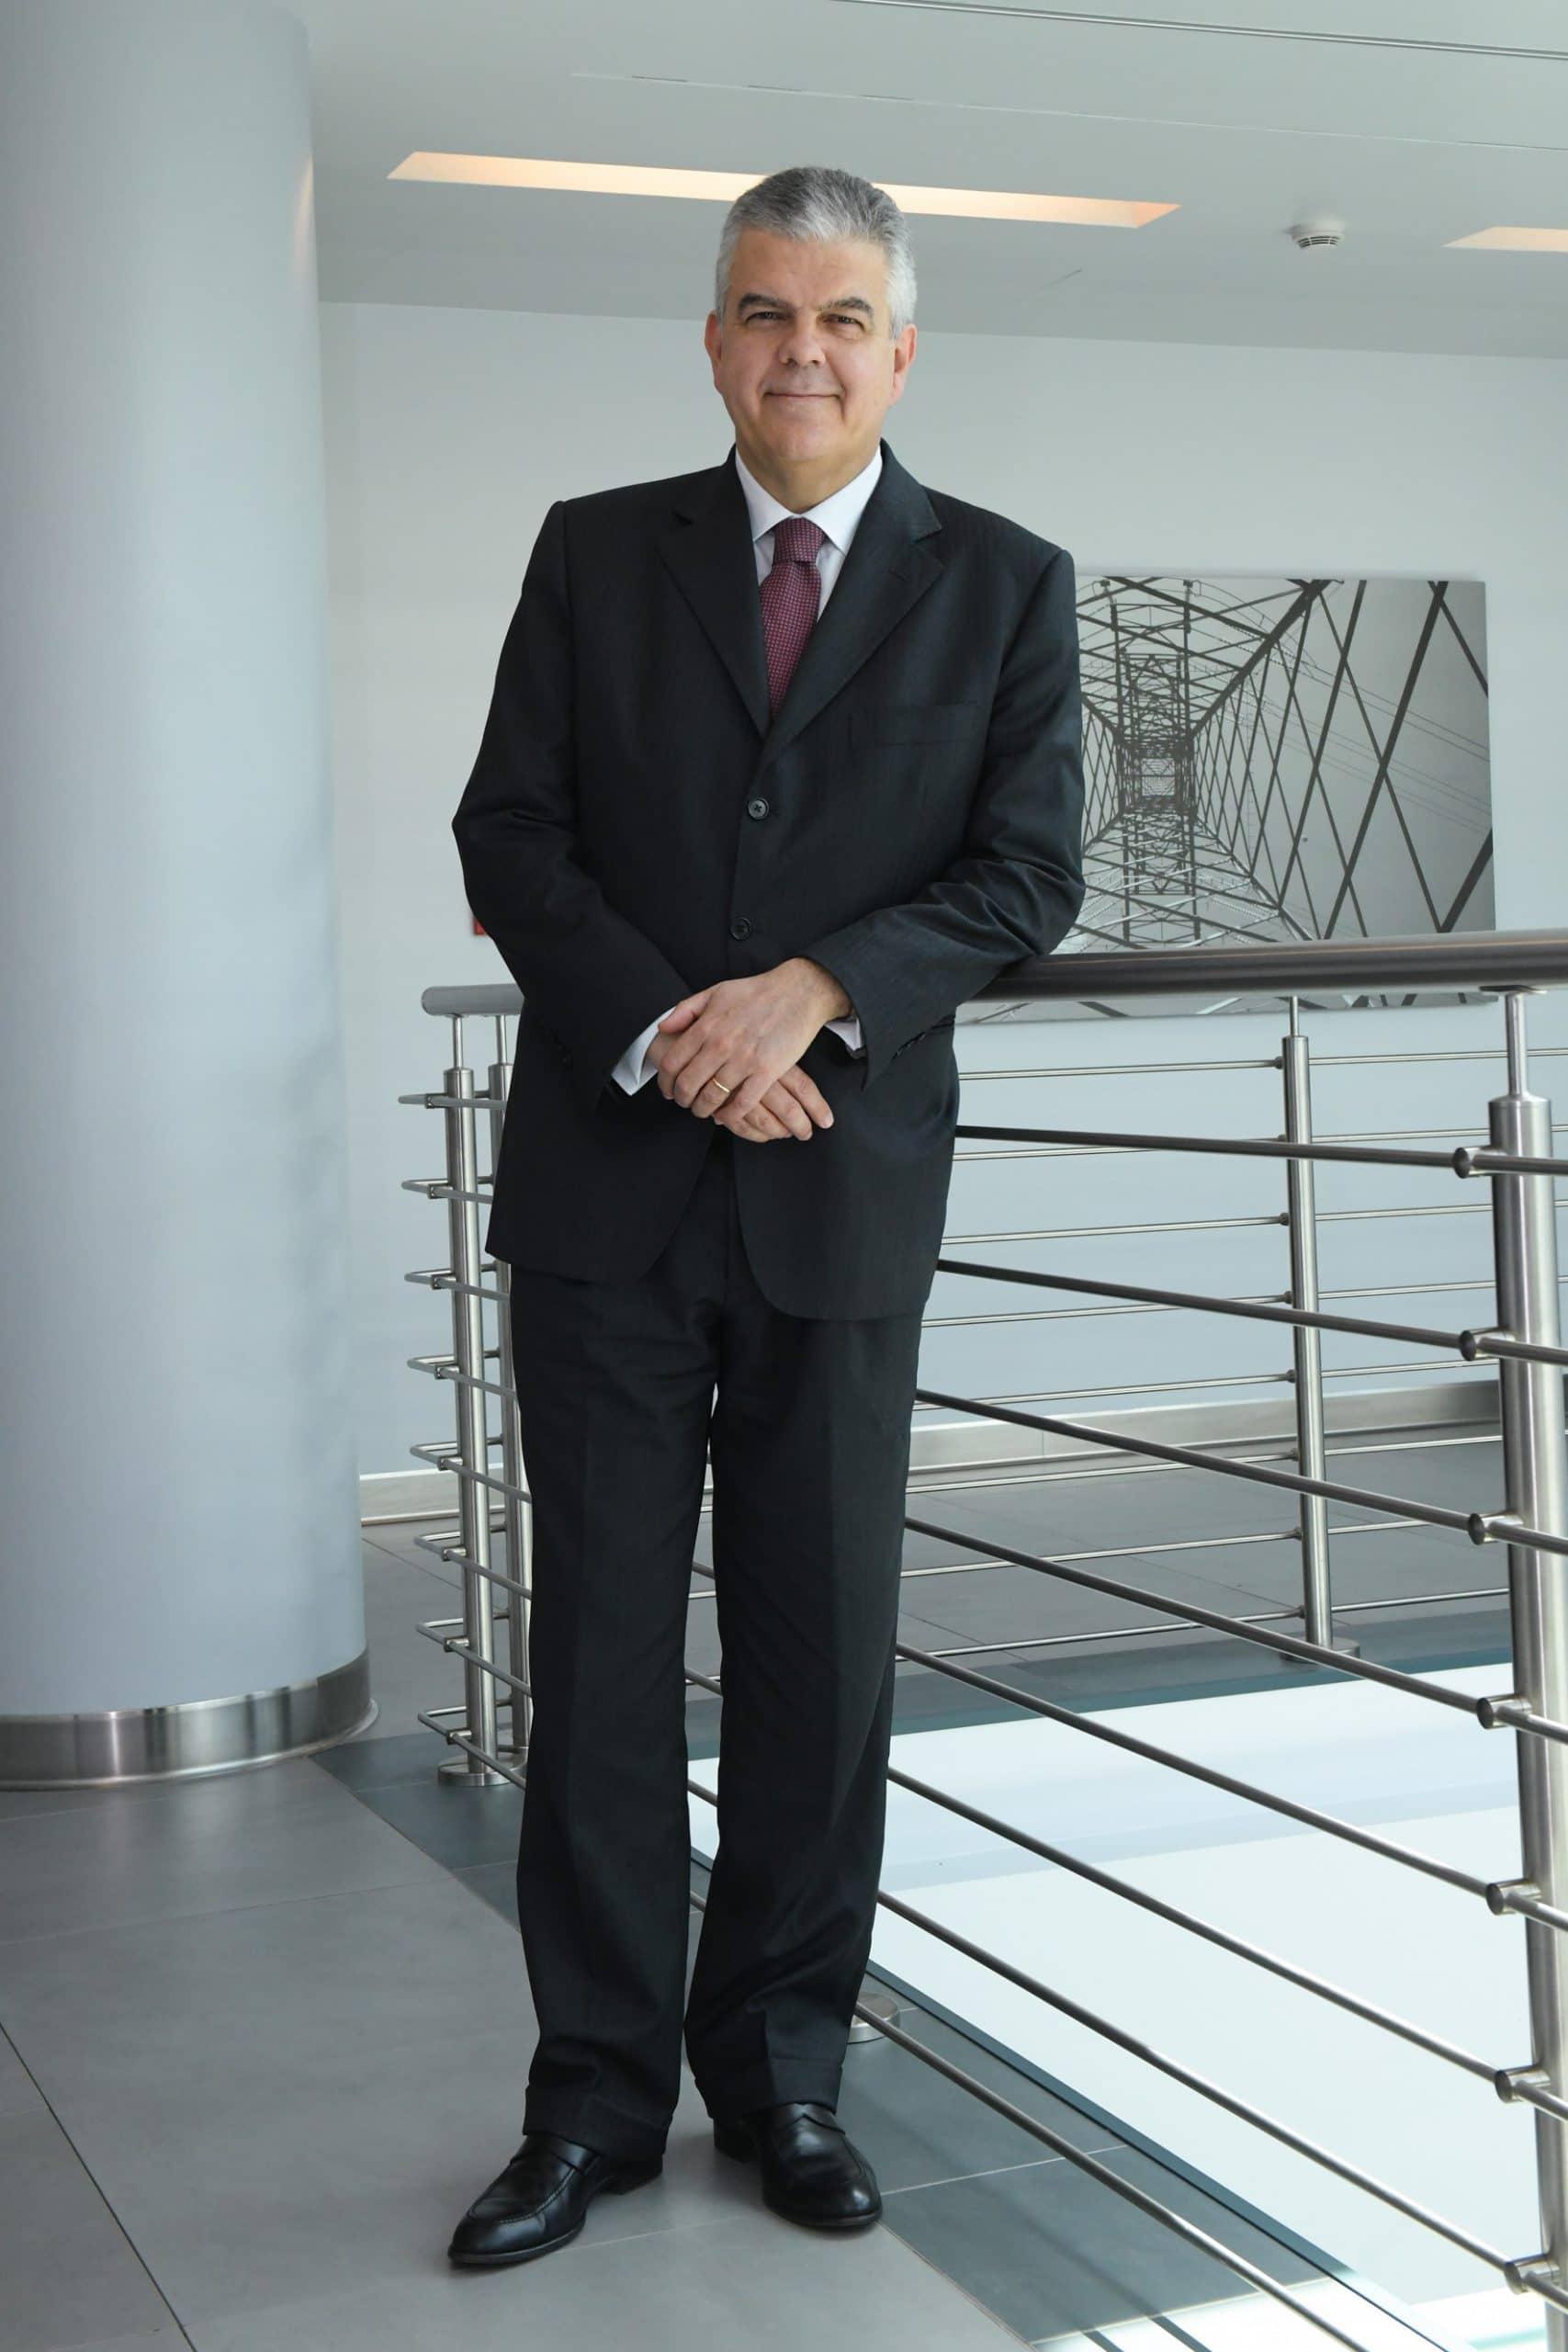 Luigi Ferraris: Terna's Strategic Plan to Accompany Energy Transition